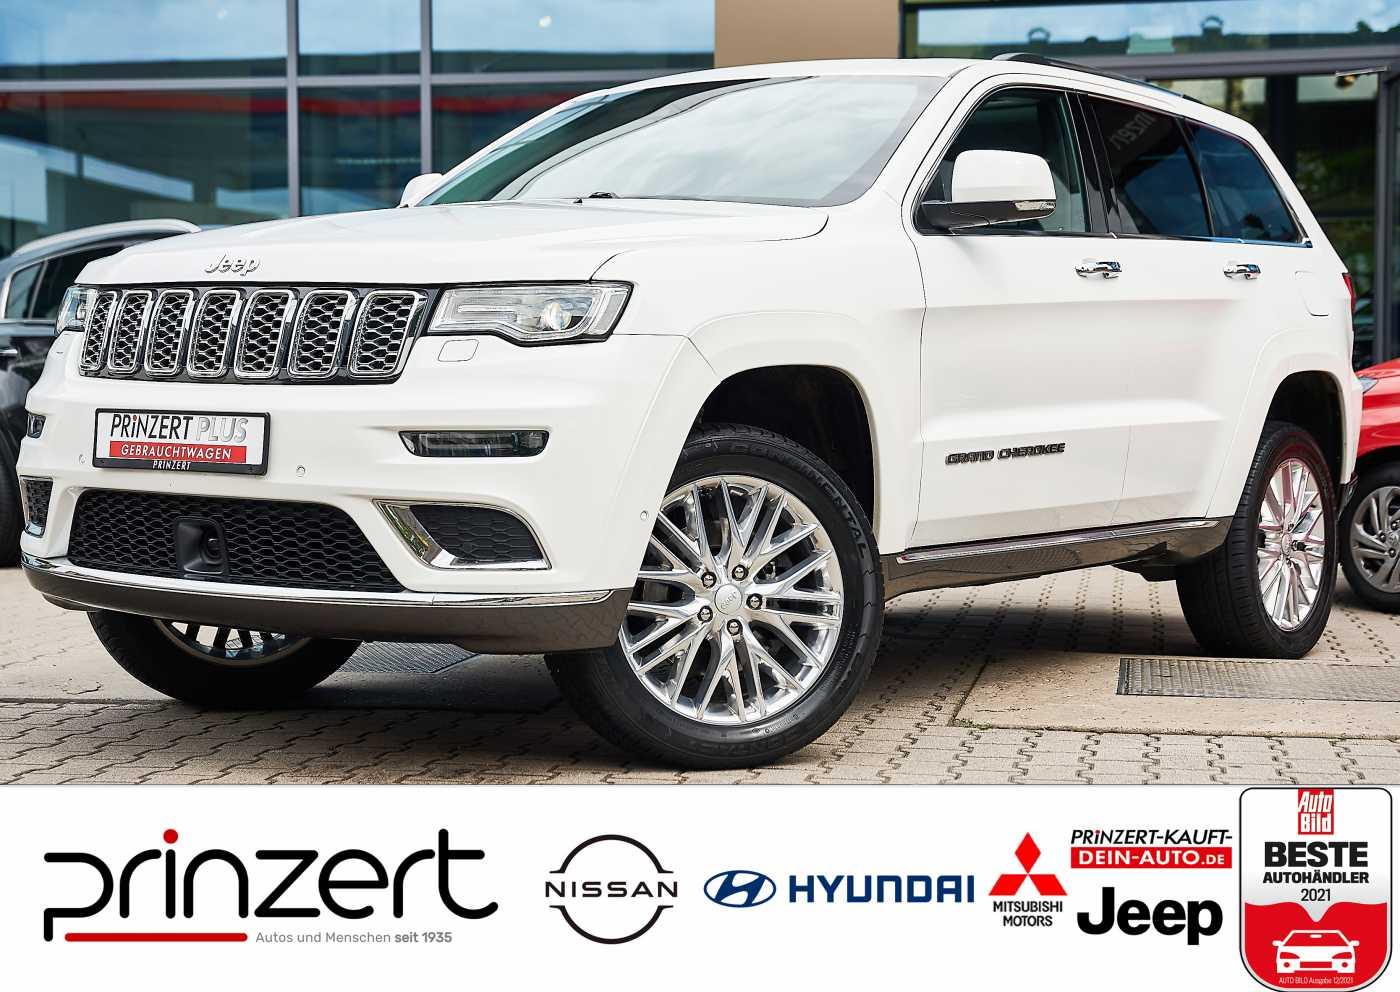 Jeep Grand Cherokee 3.0 CRD 'Summit' Leder Morocco, Jahr 2017, Diesel